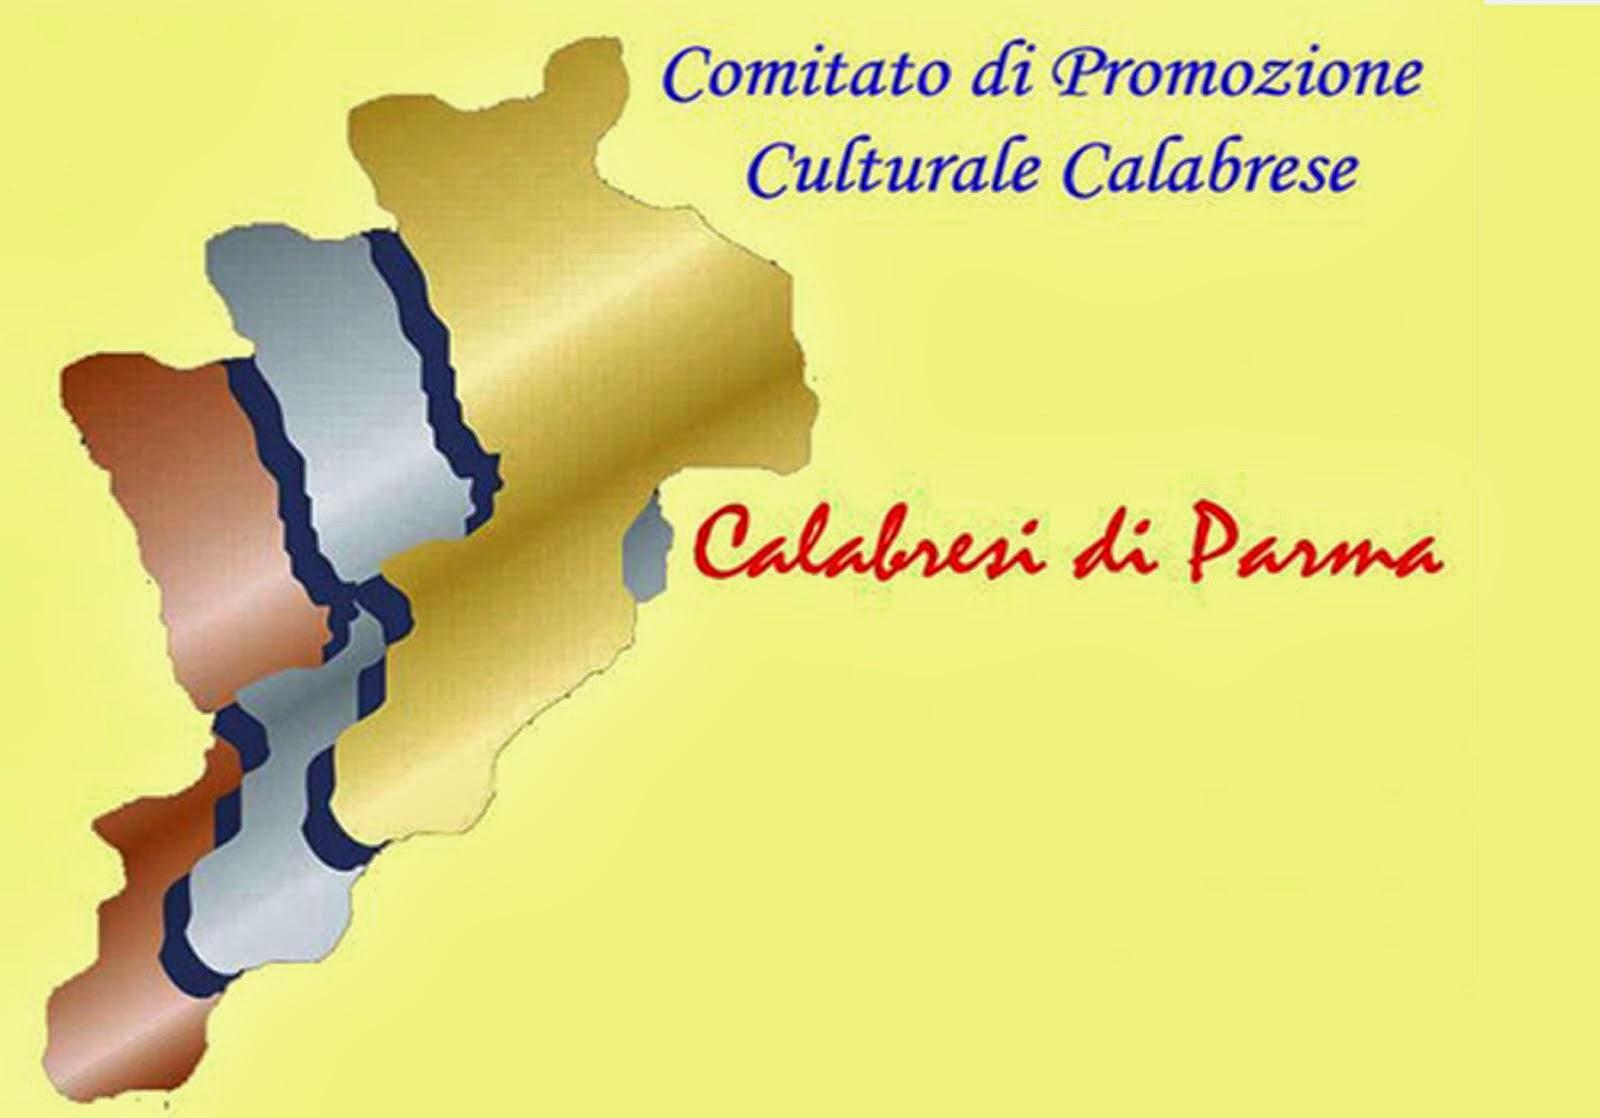 Calabresi di Parma